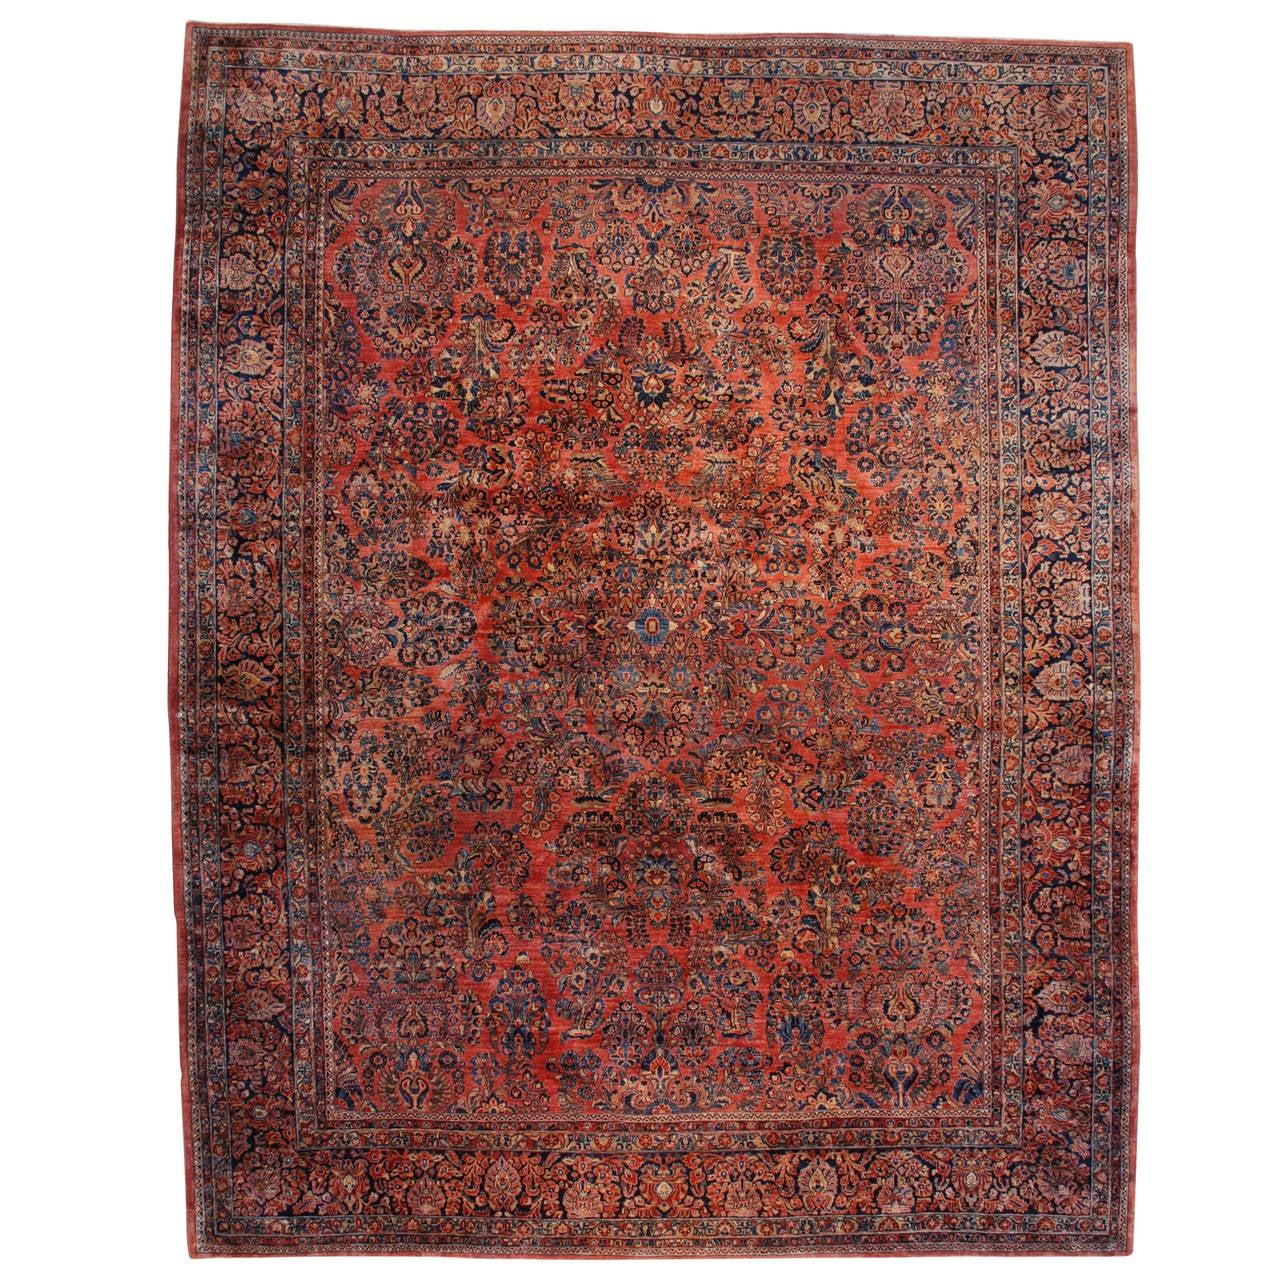 Antique Persian Sarouk Oriental Rug at 1stdibs